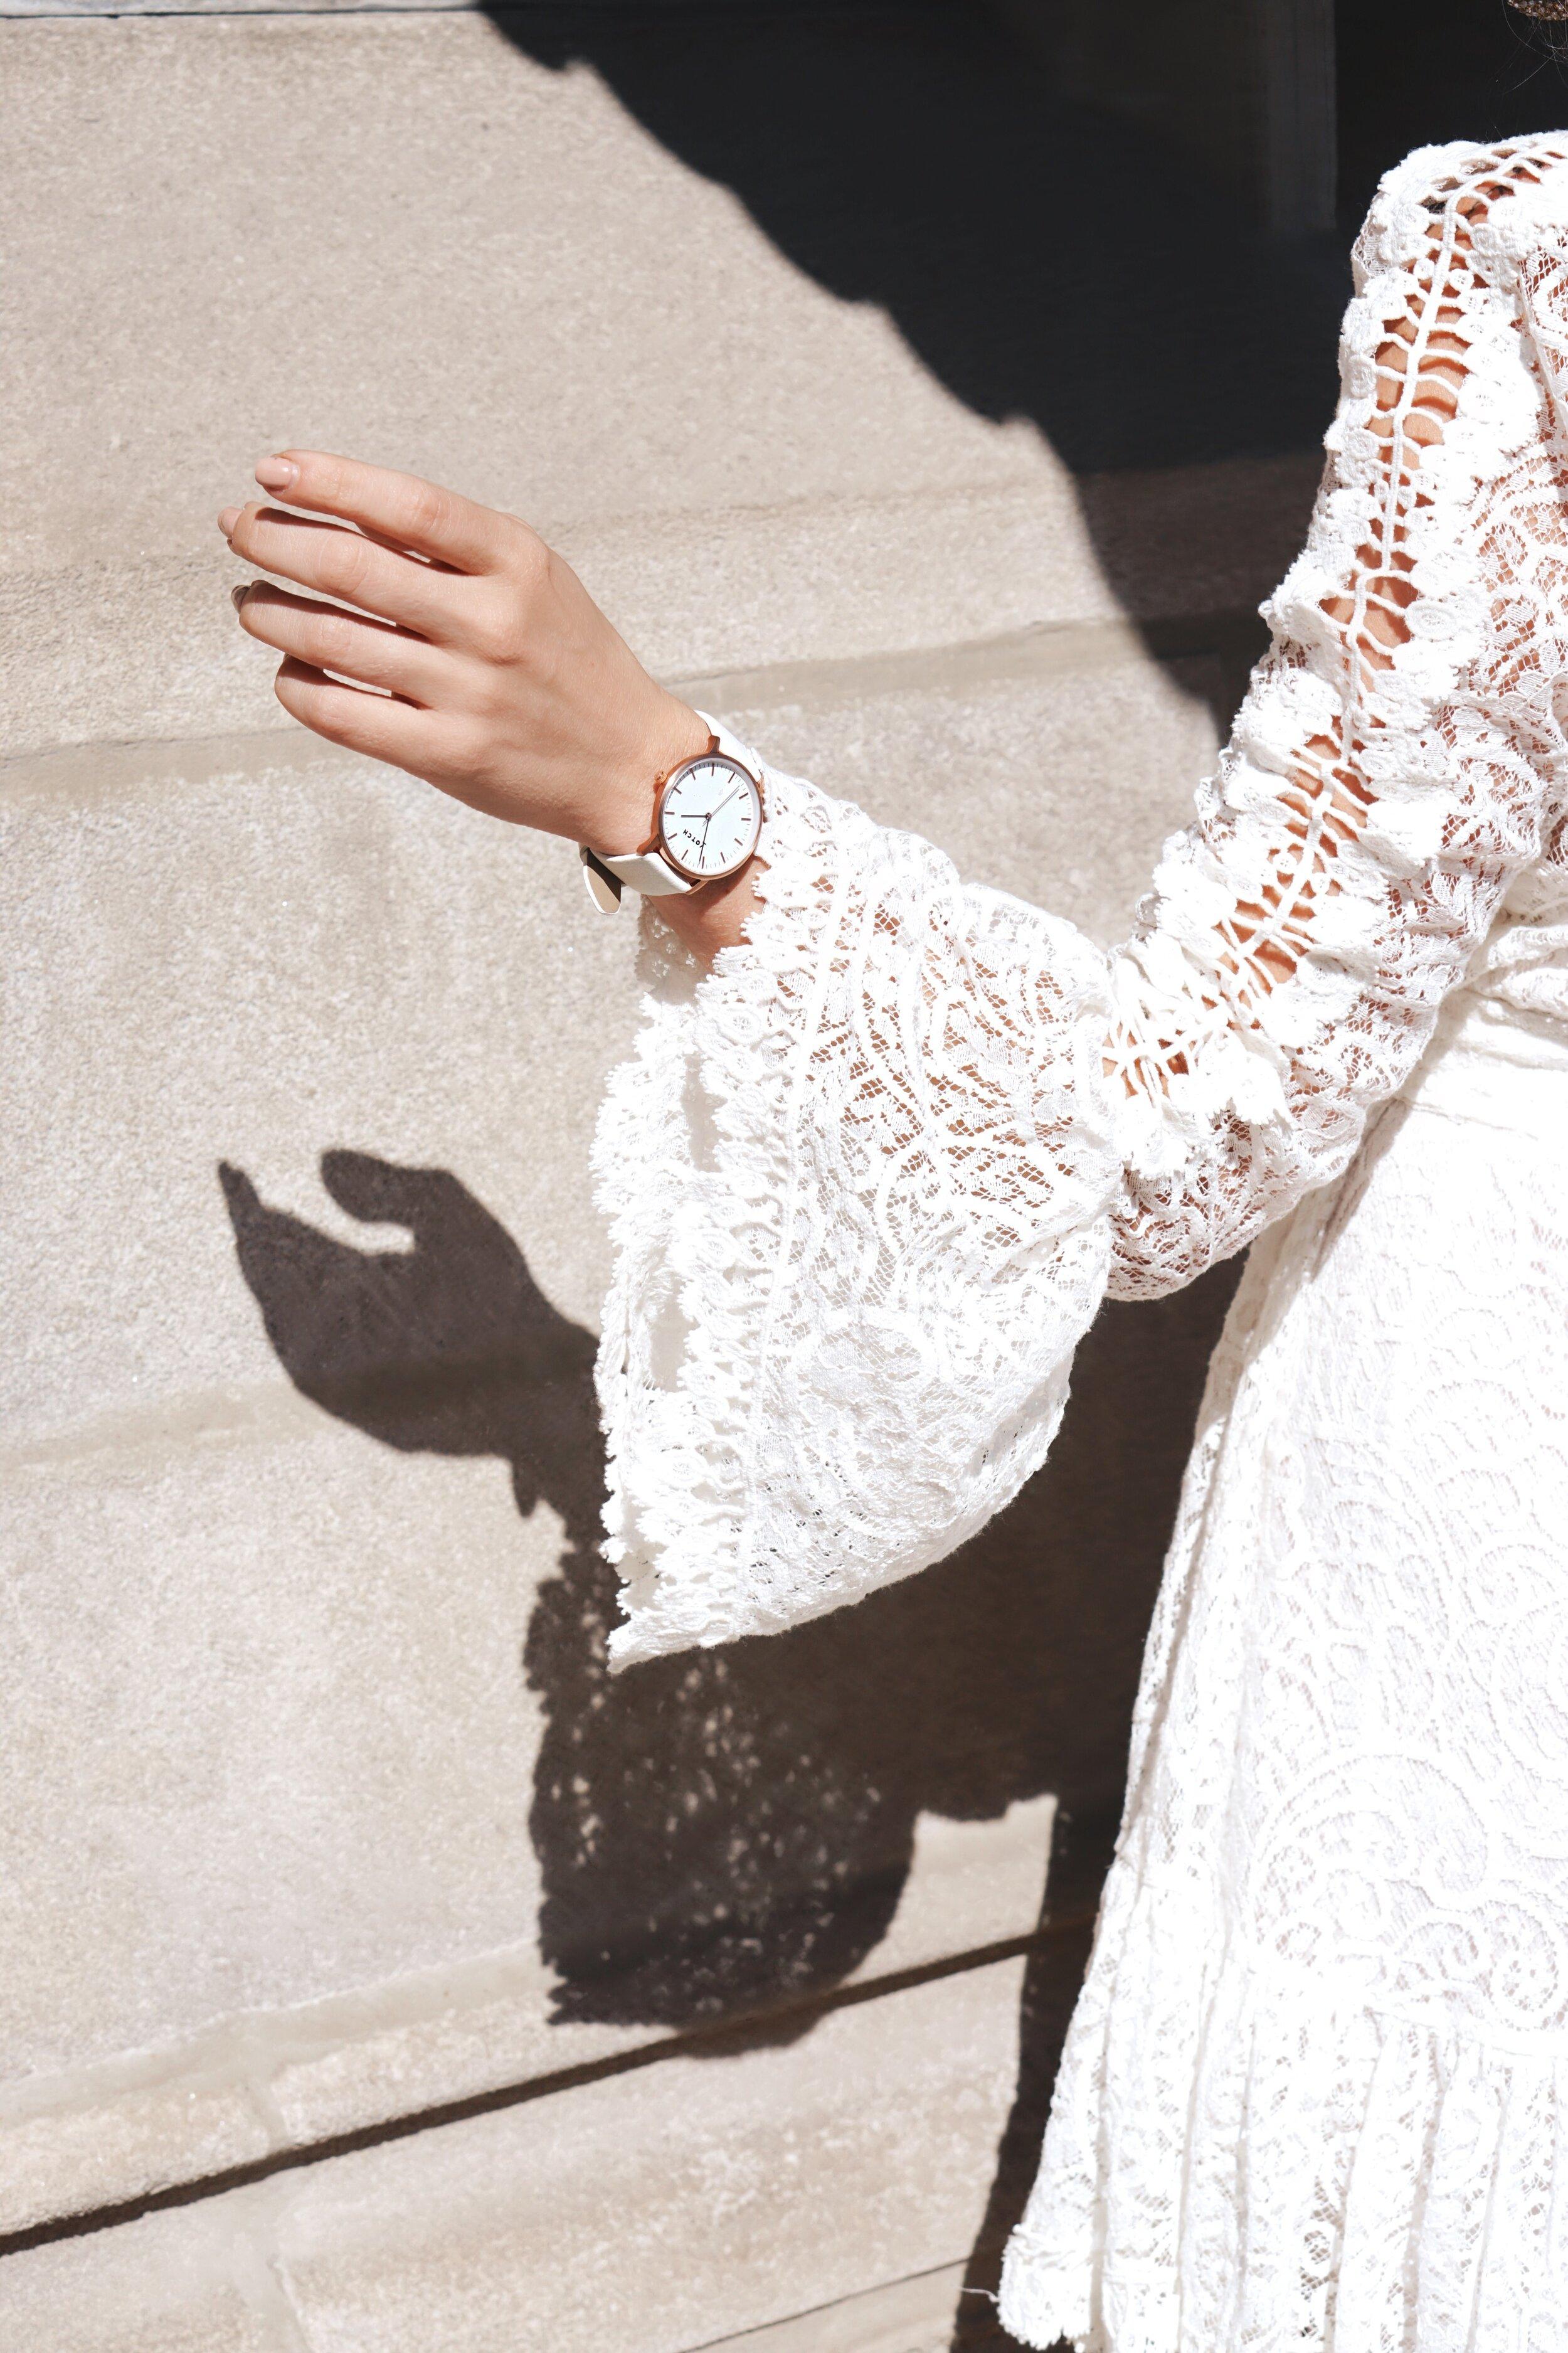 Vegan Watch, Vegan Fashion, Rose Gold Watch, Cruelty-Free Fashion, Sararose Krenger, Chicagos Best Blogger, Fashion Stylist, Chicago Style